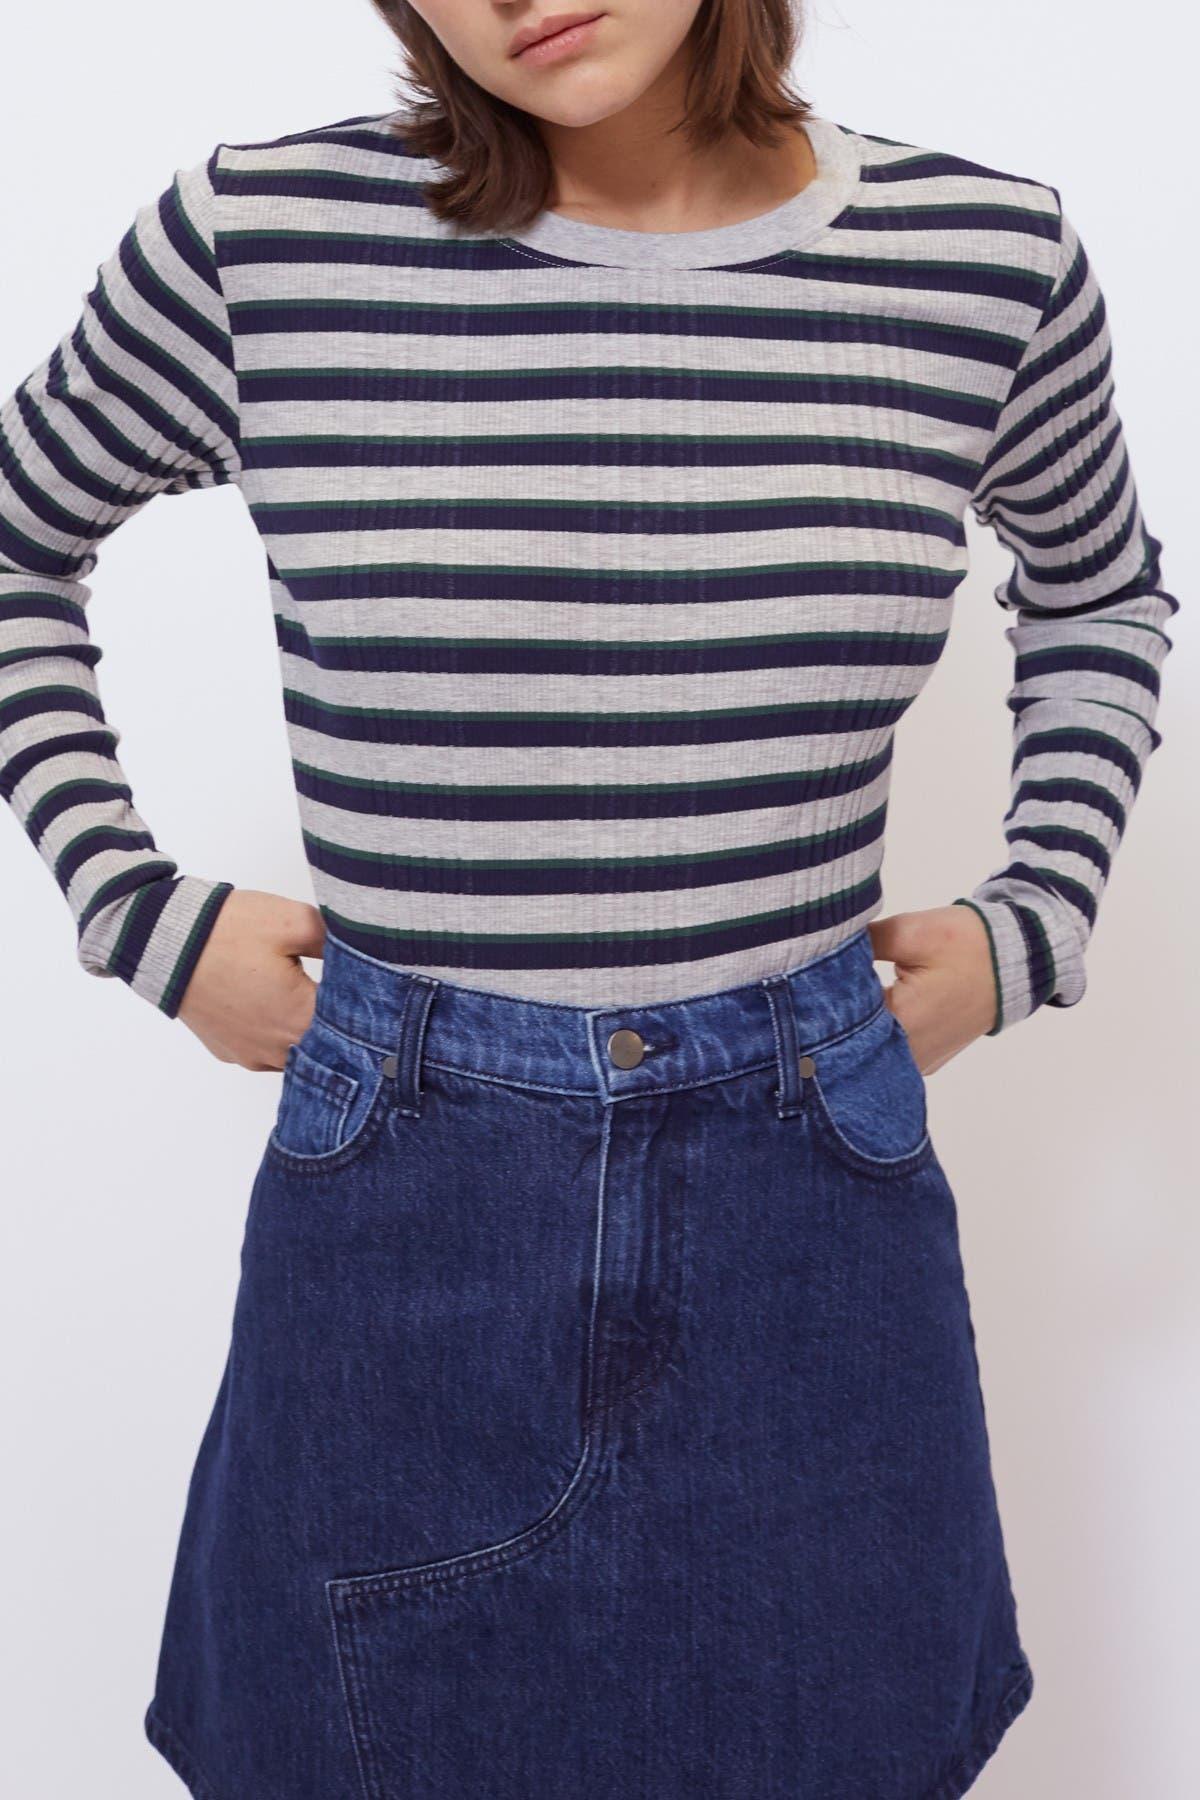 Image of BALDWIN Holland Sweater